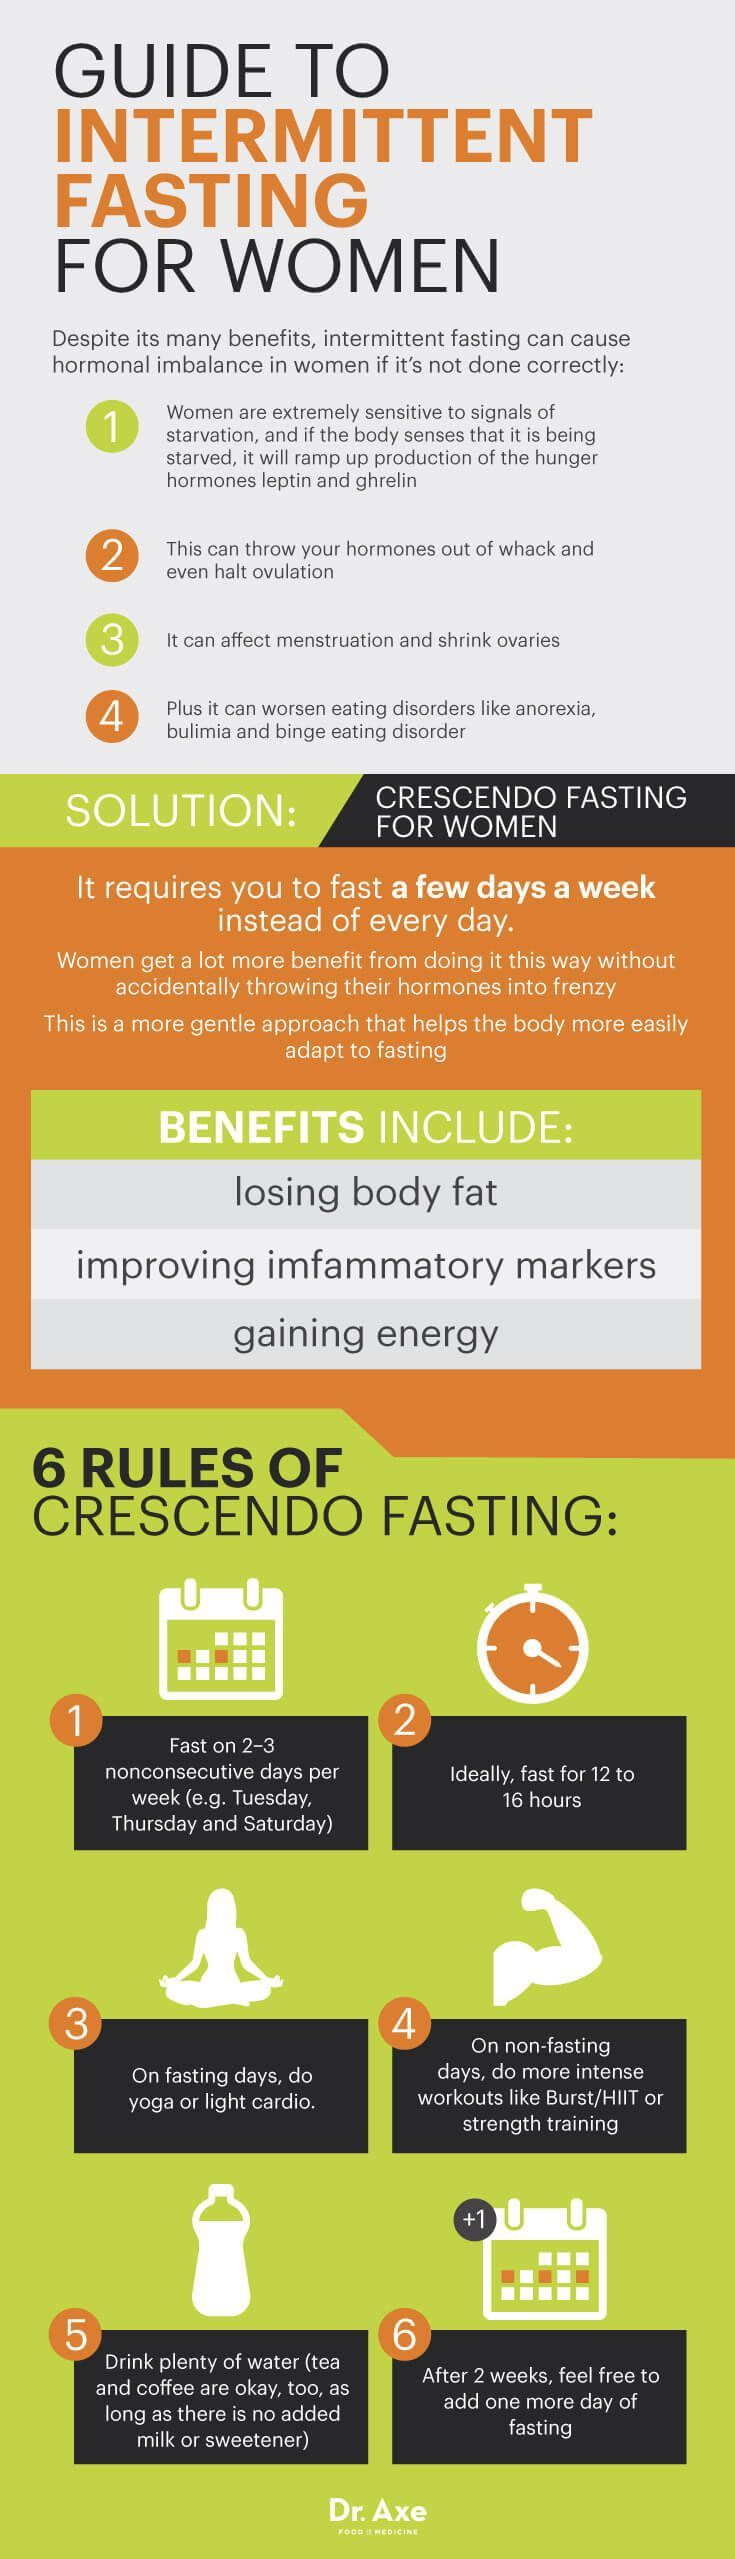 Crescendo fasting - Dr. Axe http://www.draxe.com #health #holistic #natural